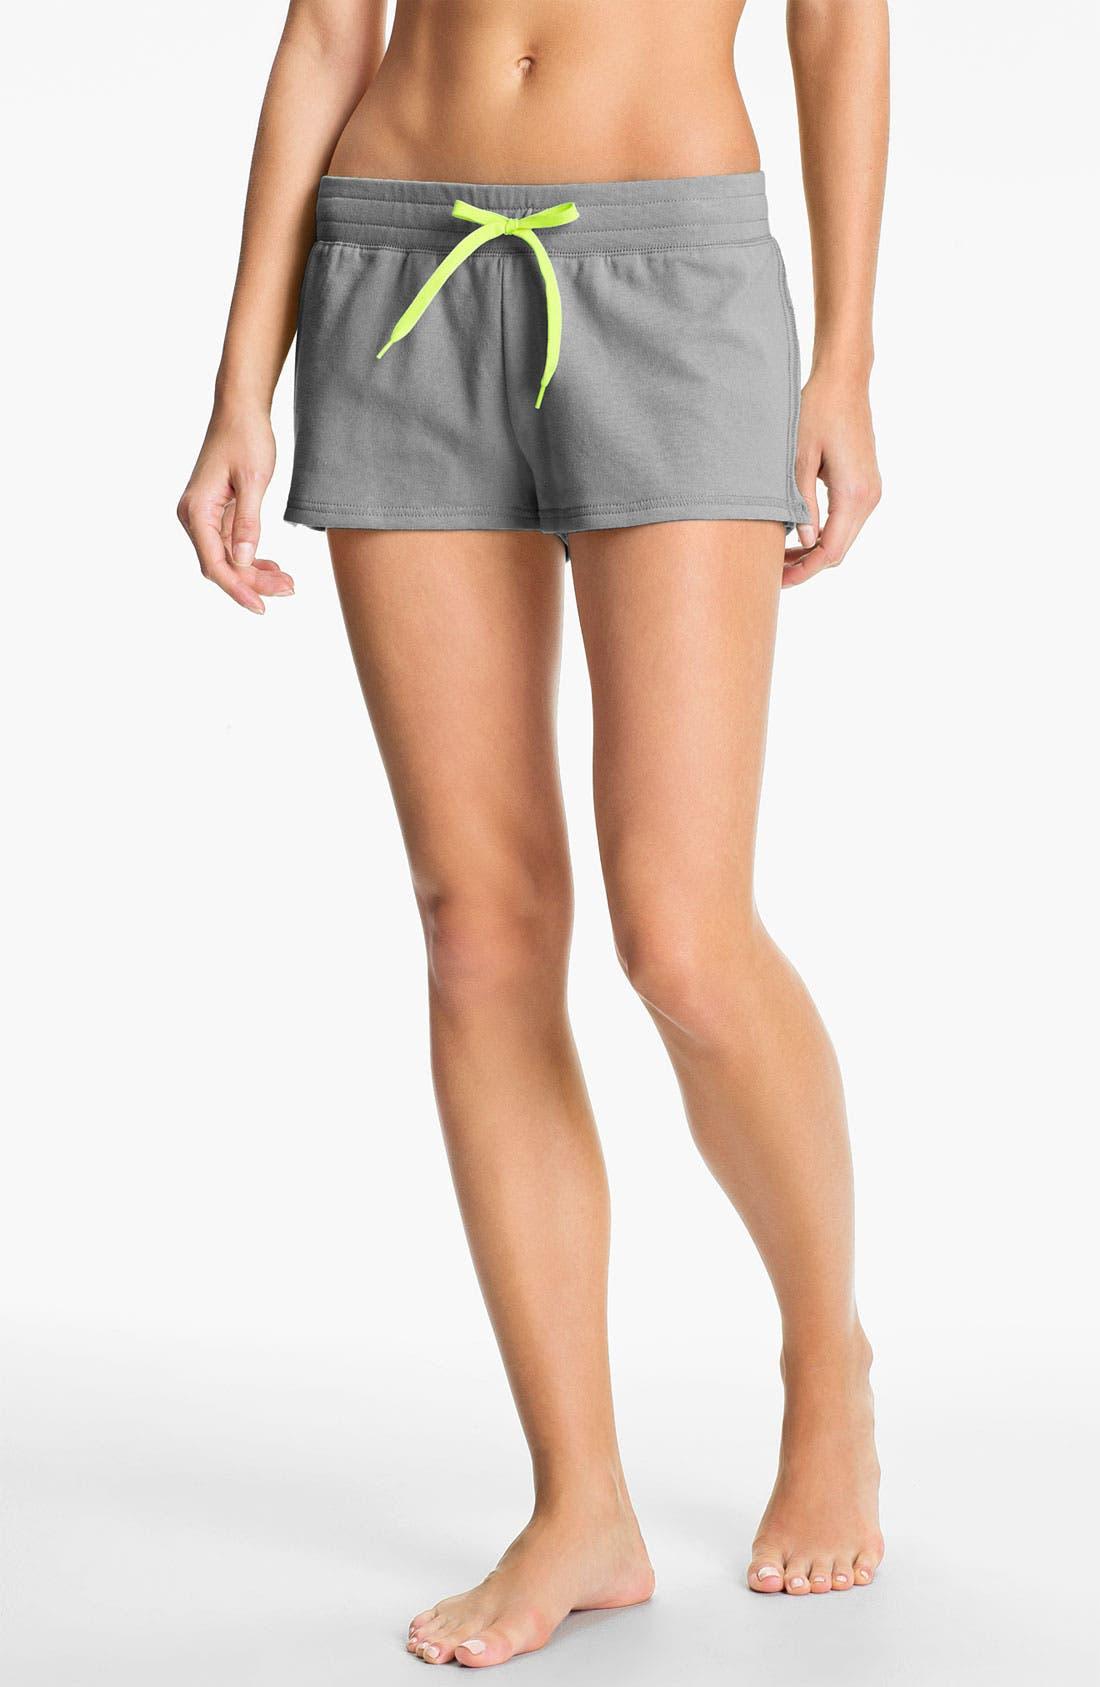 Alternate Image 1 Selected - Steve Madden Knit Lounge Shorts